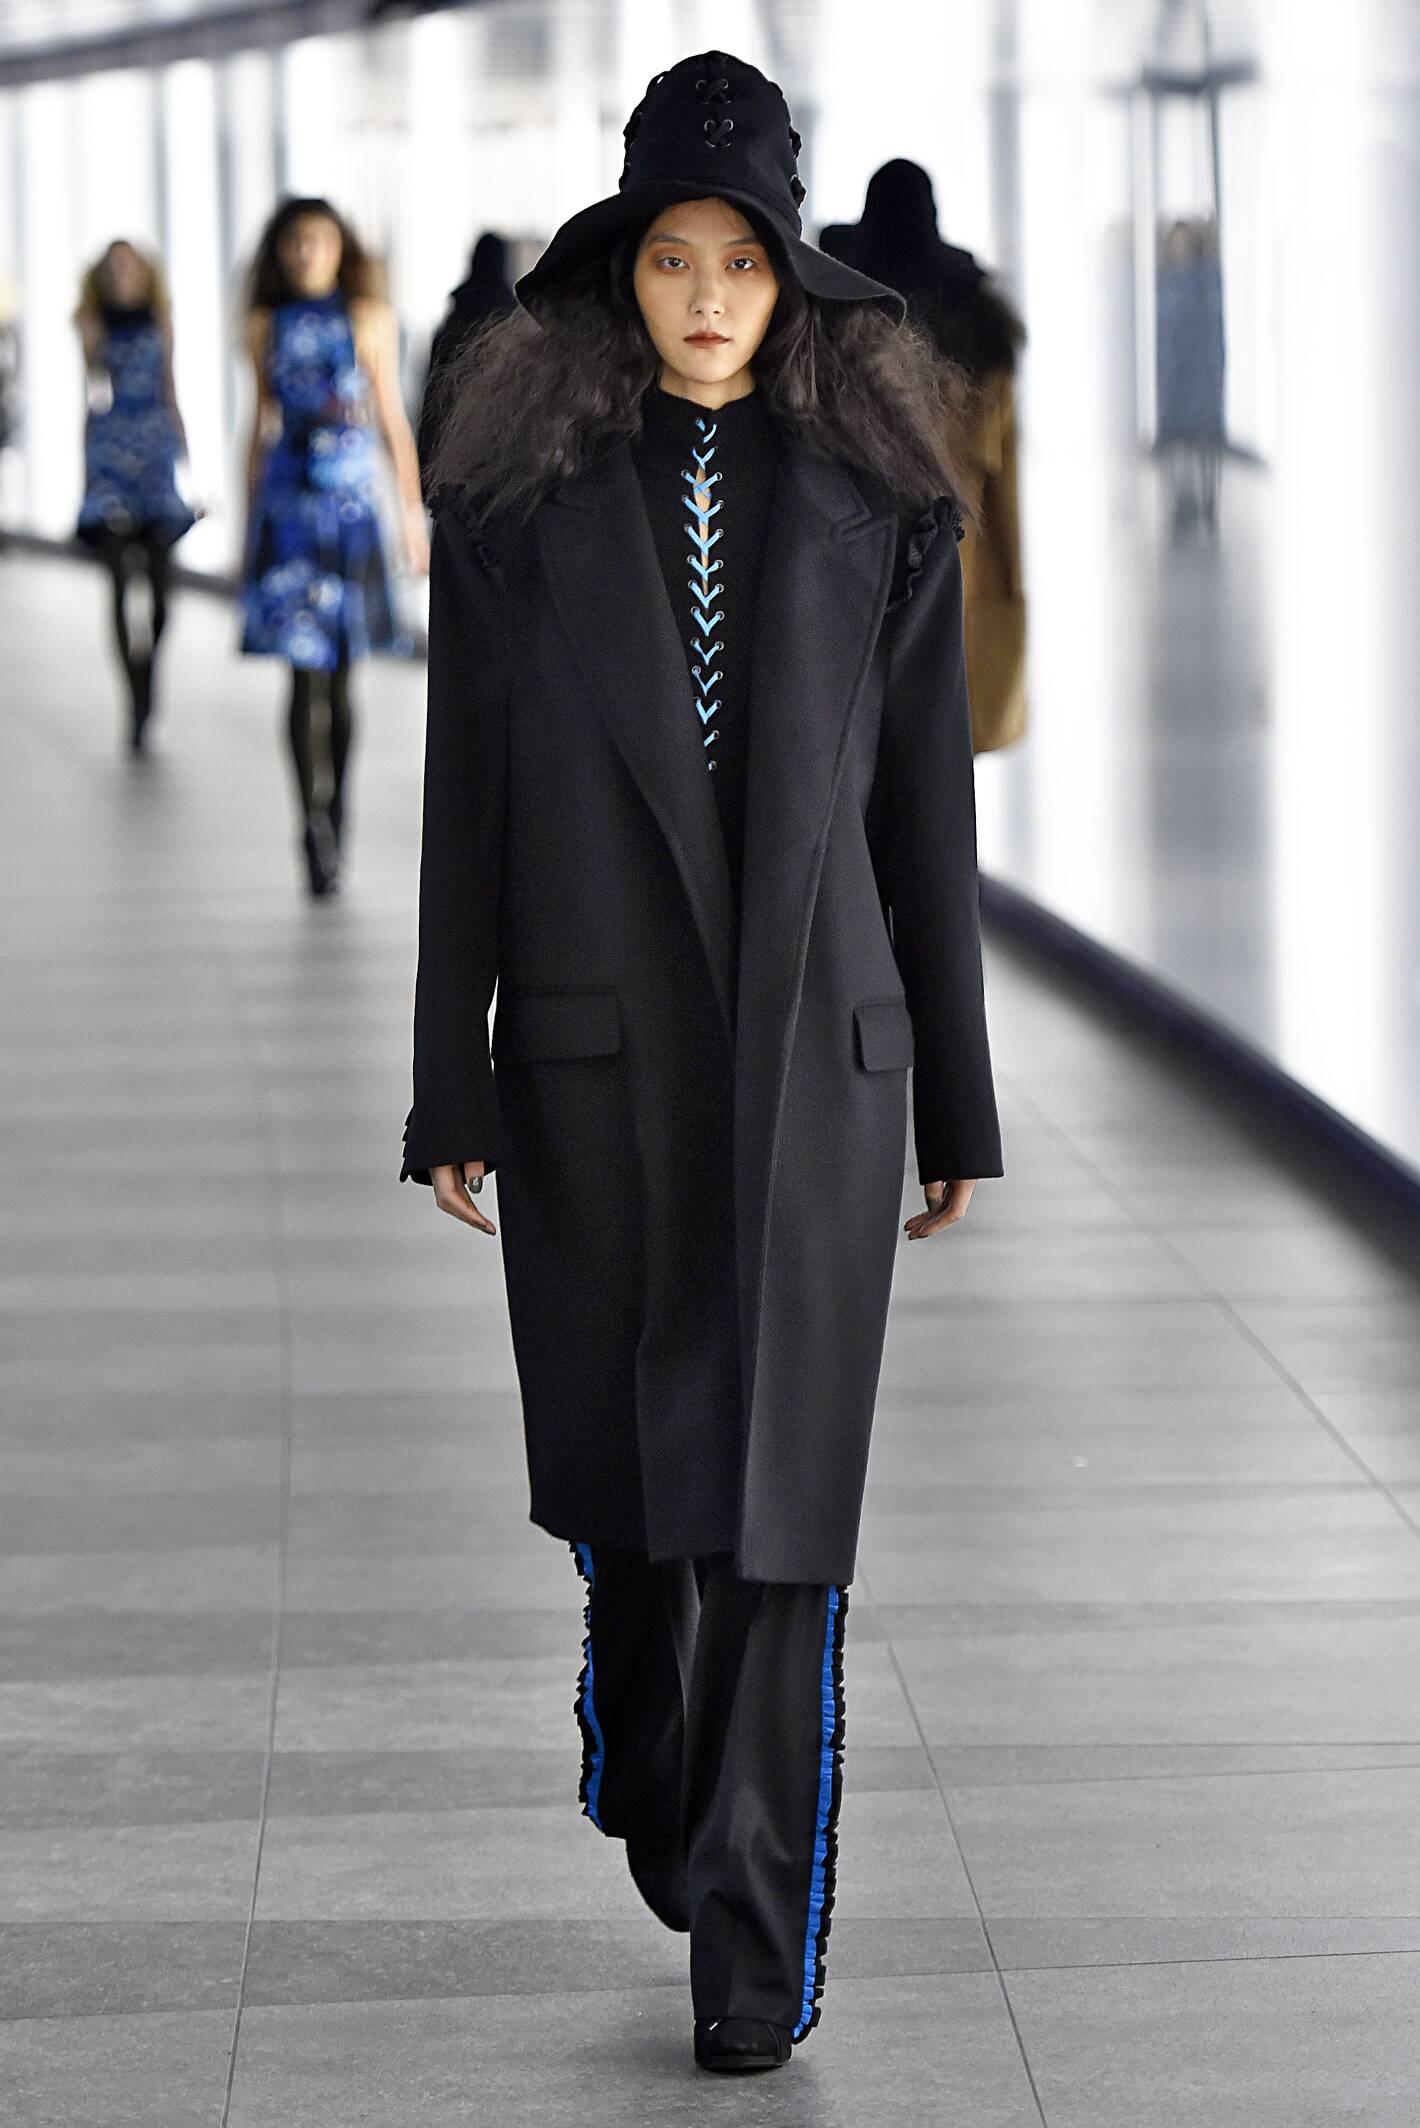 Preen by Thornton Bregazzi Collection Fashion Show FW 2015 2016